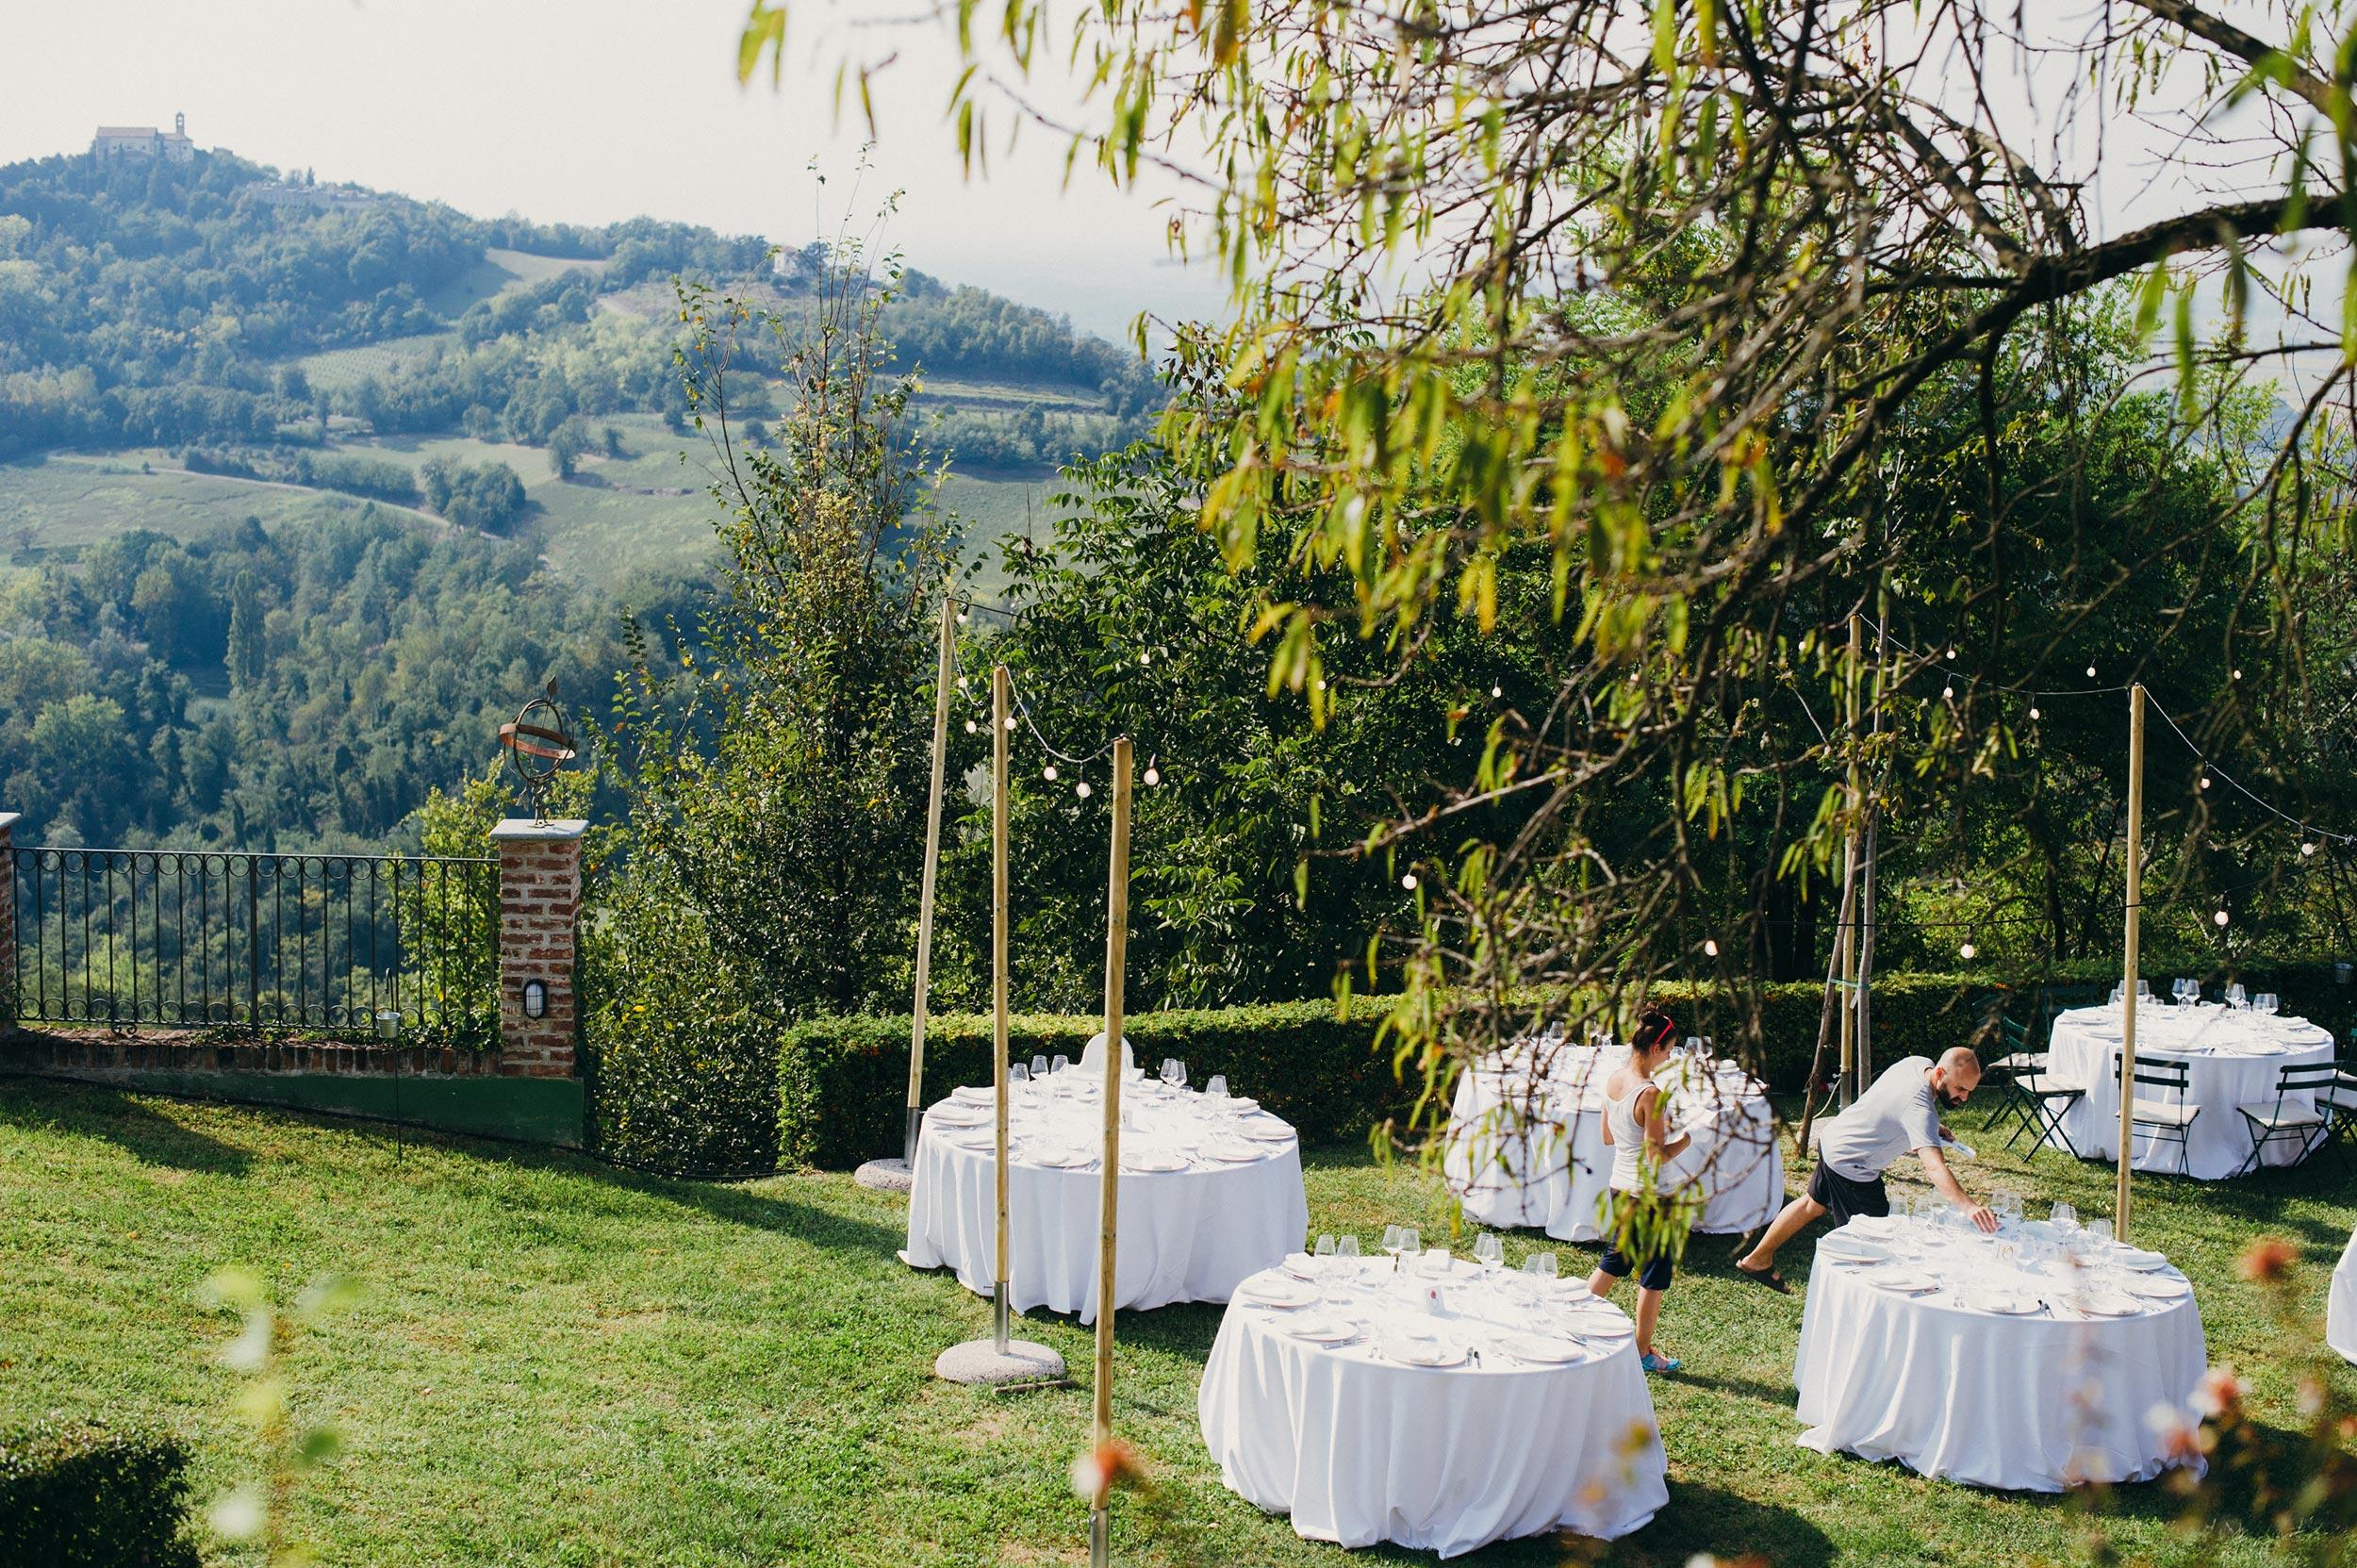 2016-Davor-Chiara-Monferrato-Asti-Vercelli-Wedding-Photographer-Italy-Alessandro-Avenali-7.jpg